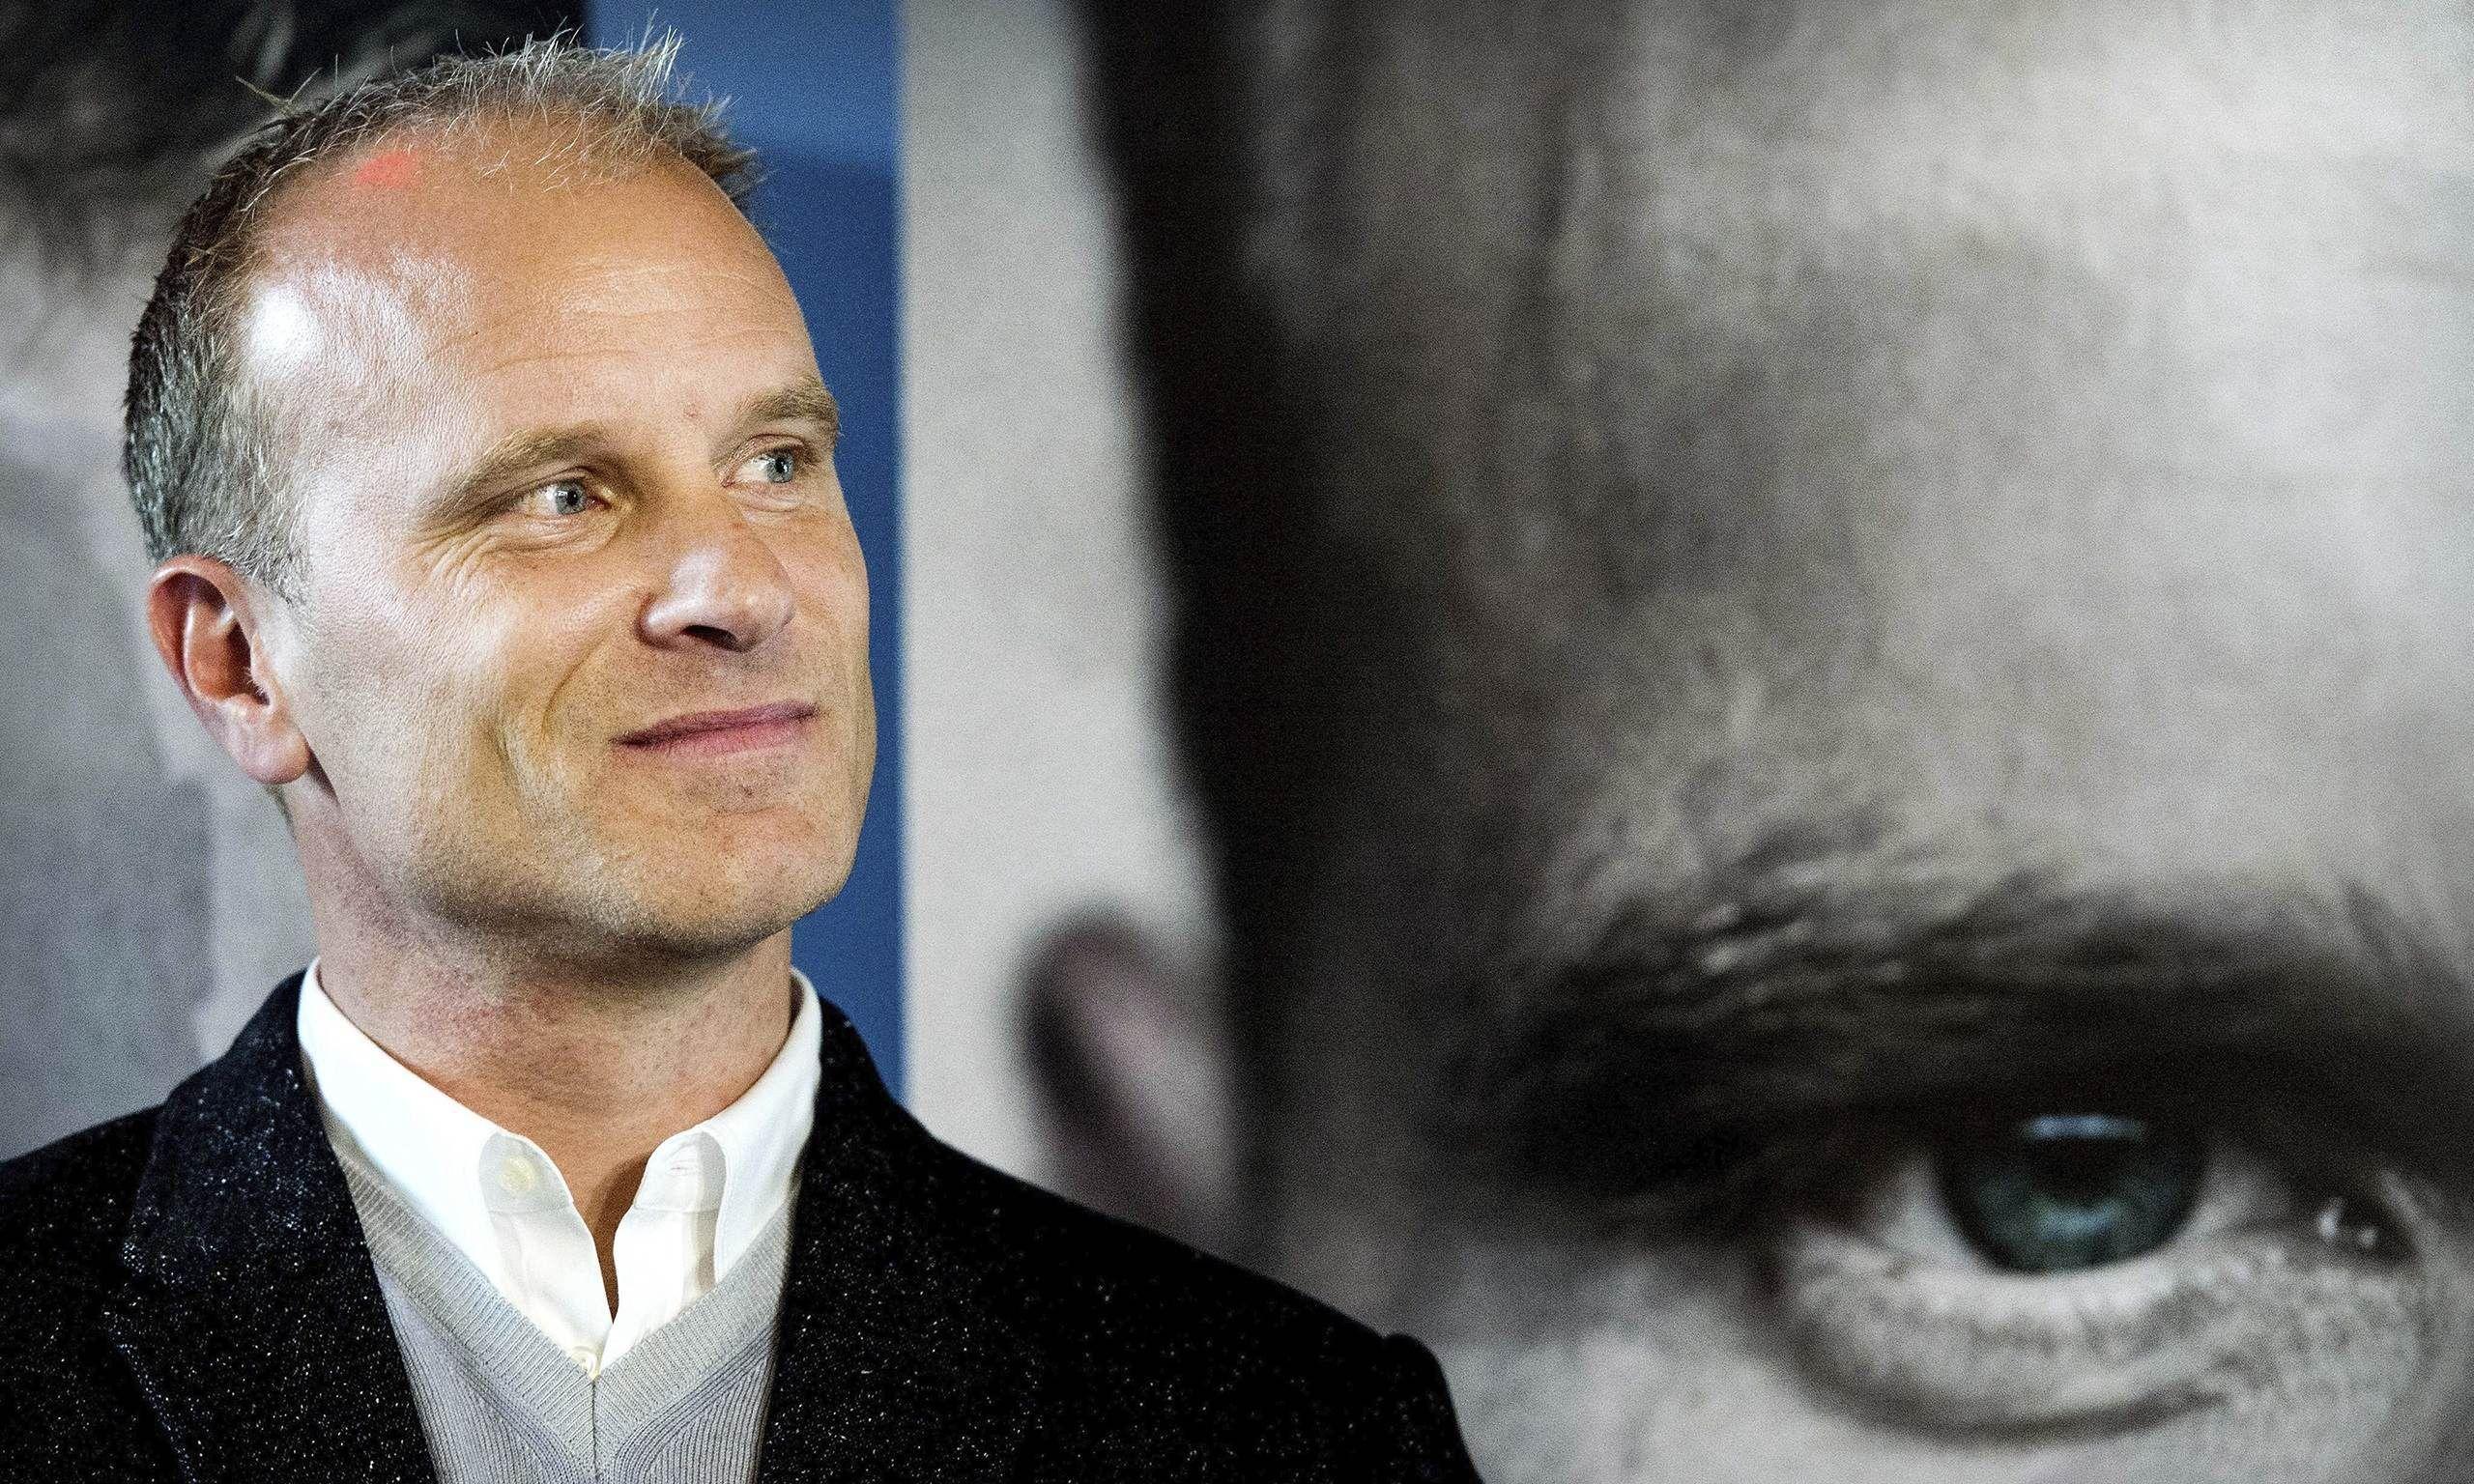 ¿En qué equipos jugó Dennis Bergkamp?